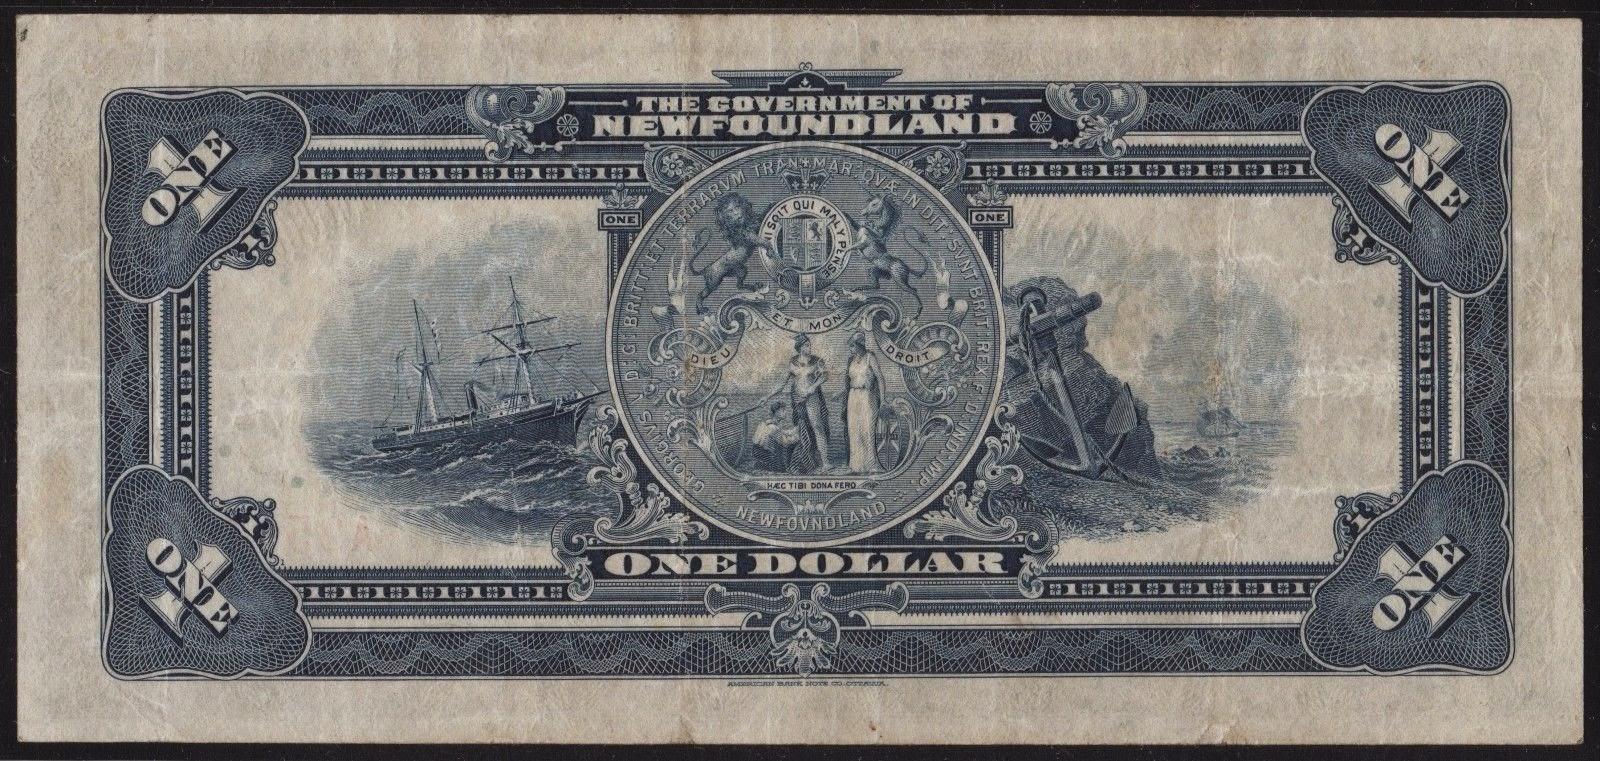 Newfoundland Banknotes 1 Dollar note